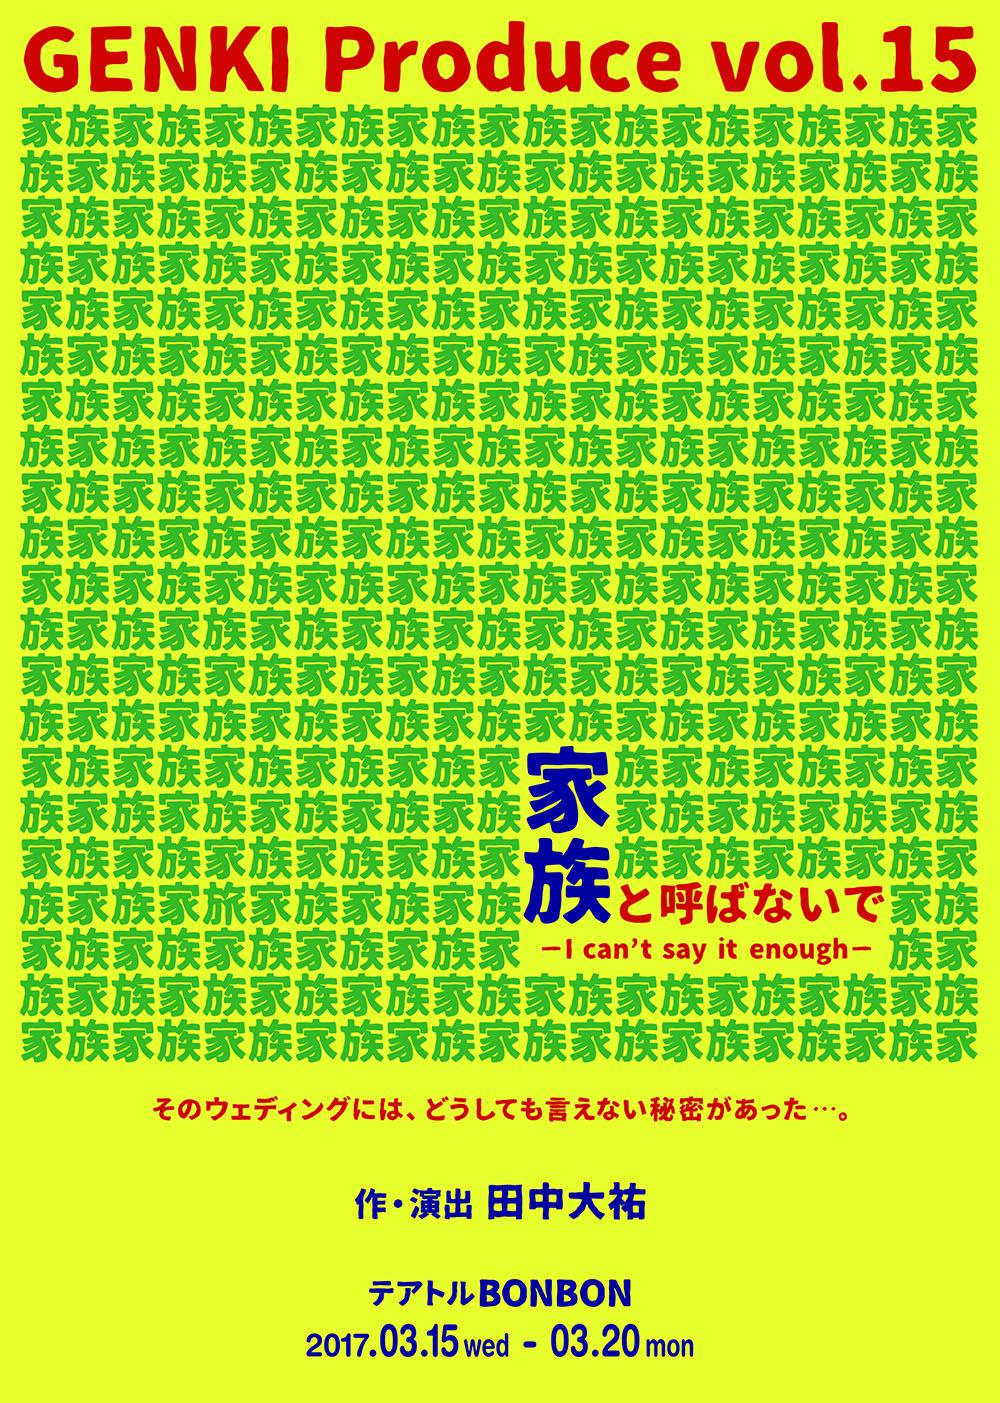 GENKI Produce vol.15「家族と呼ばないで ~I can't say it enough~」